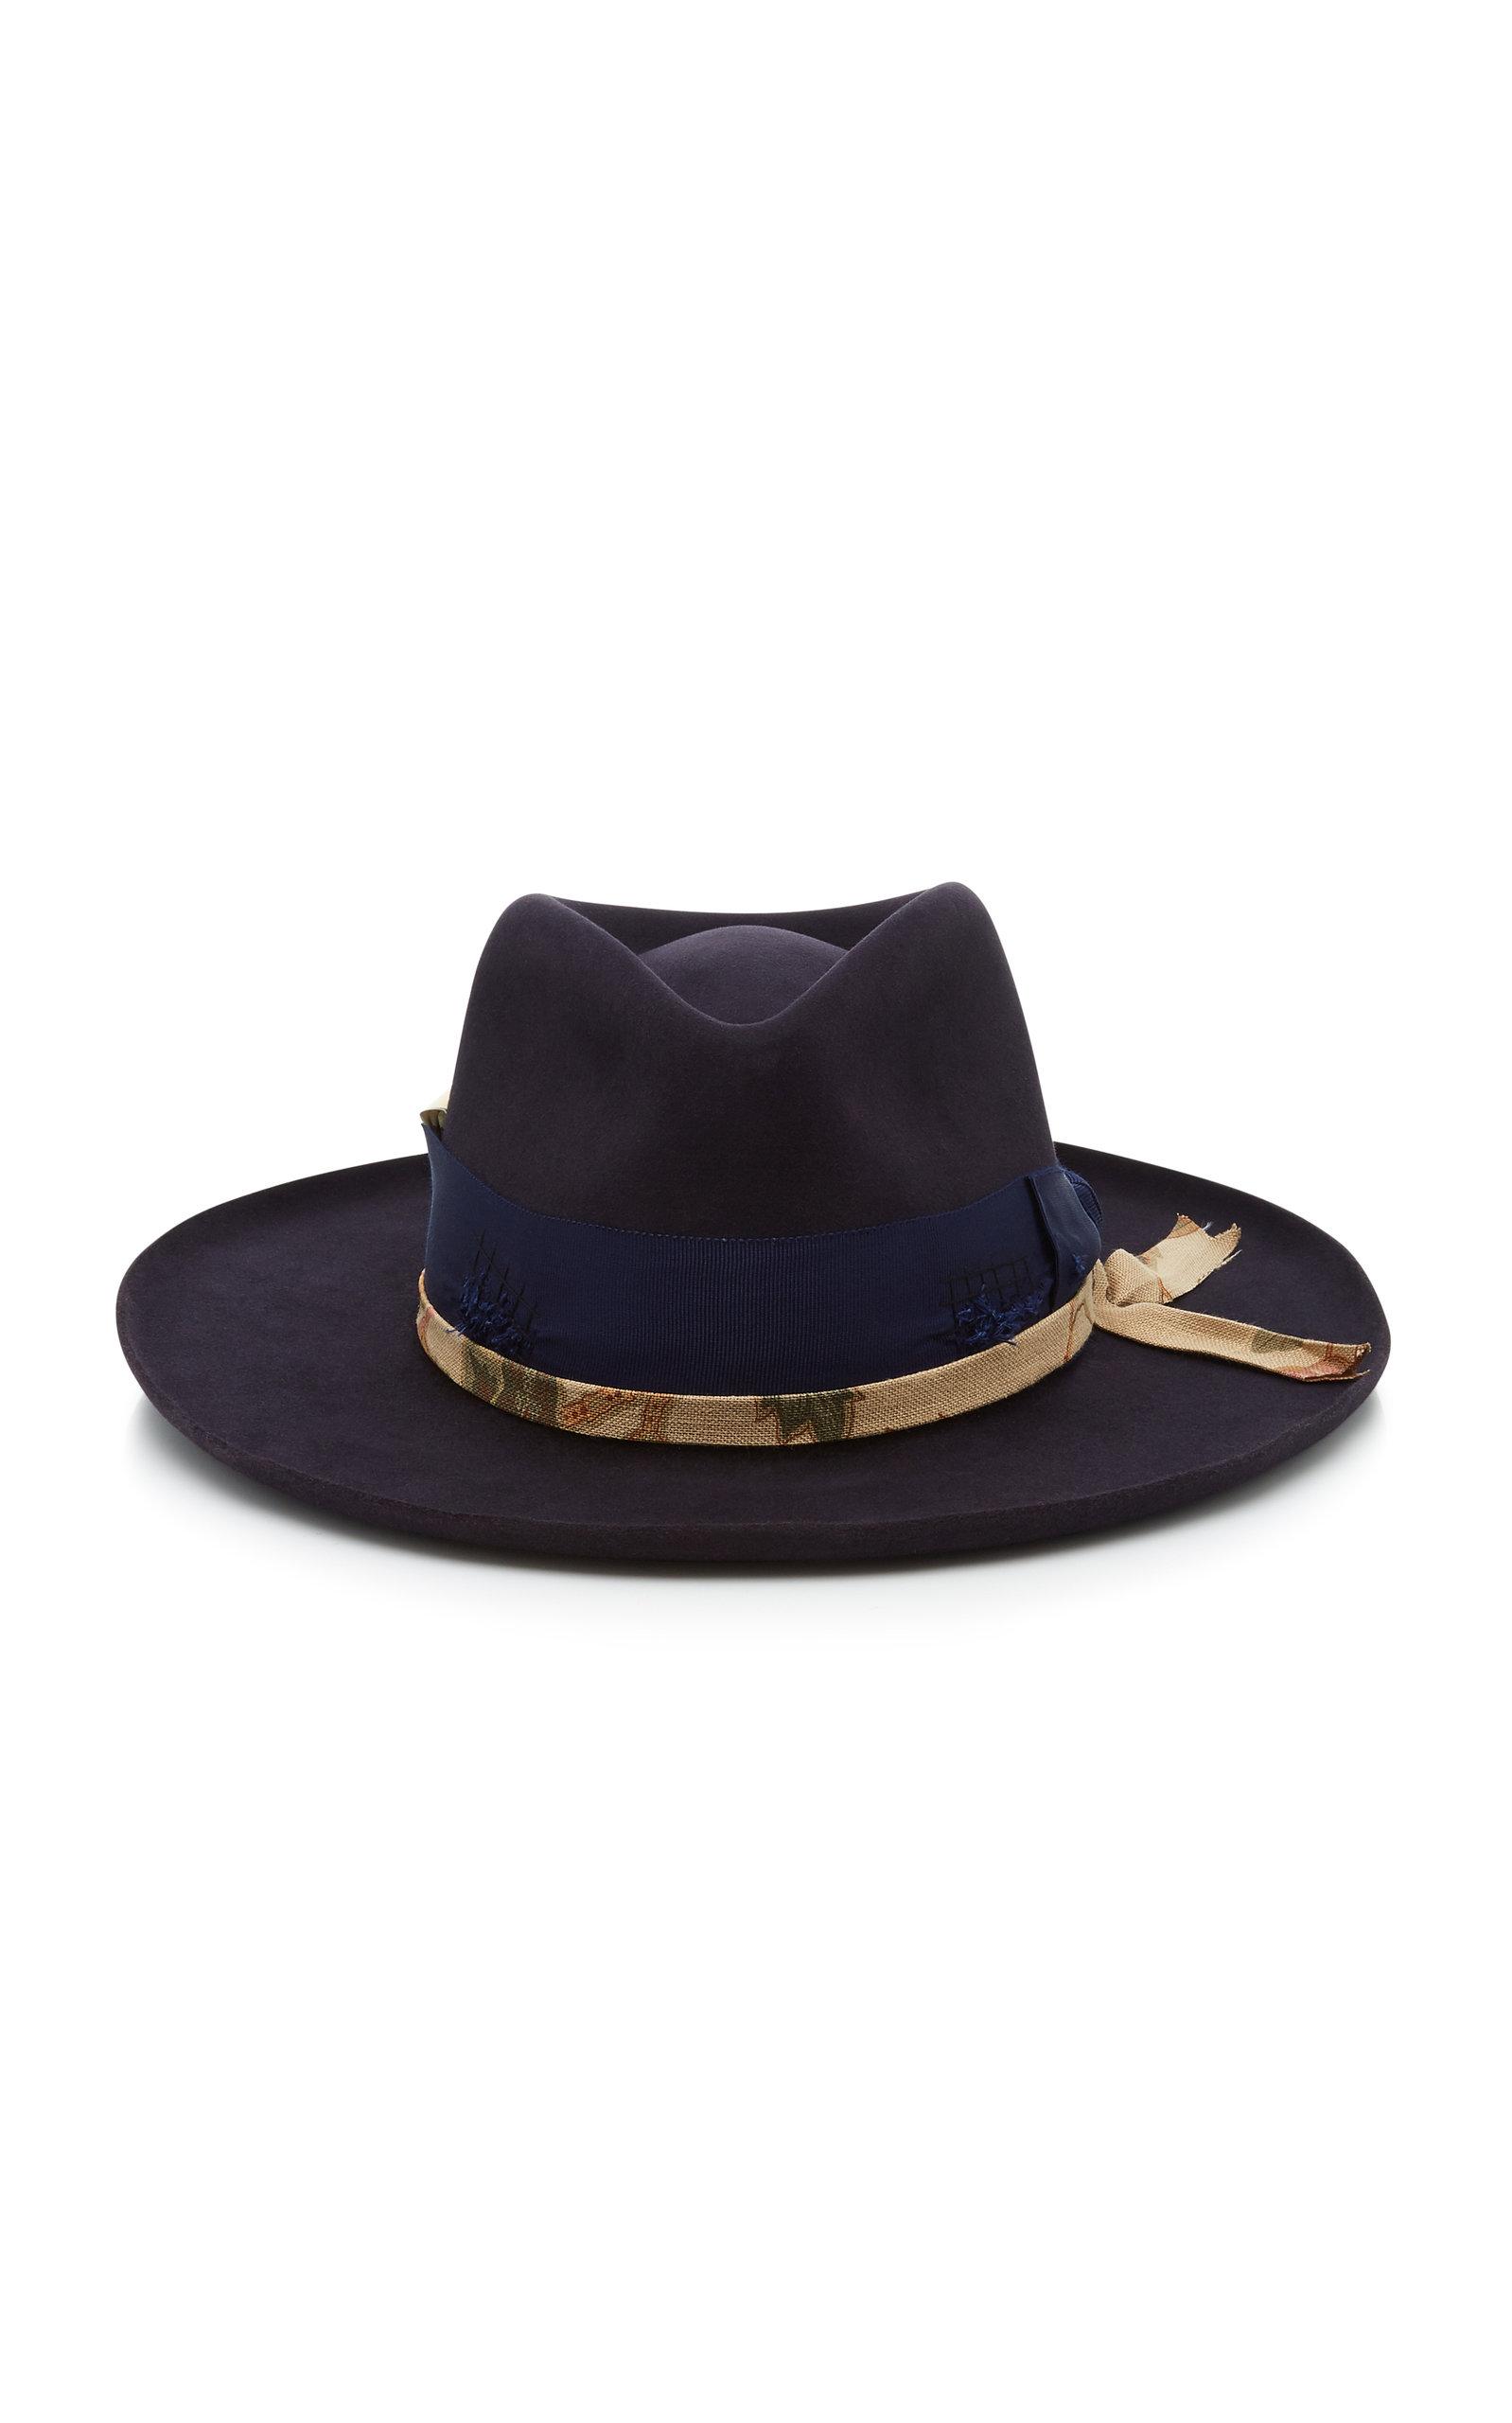 Nick FouquetExclusive Astral Smoke Hat. CLOSE. Loading 6e2f2ed4cac4